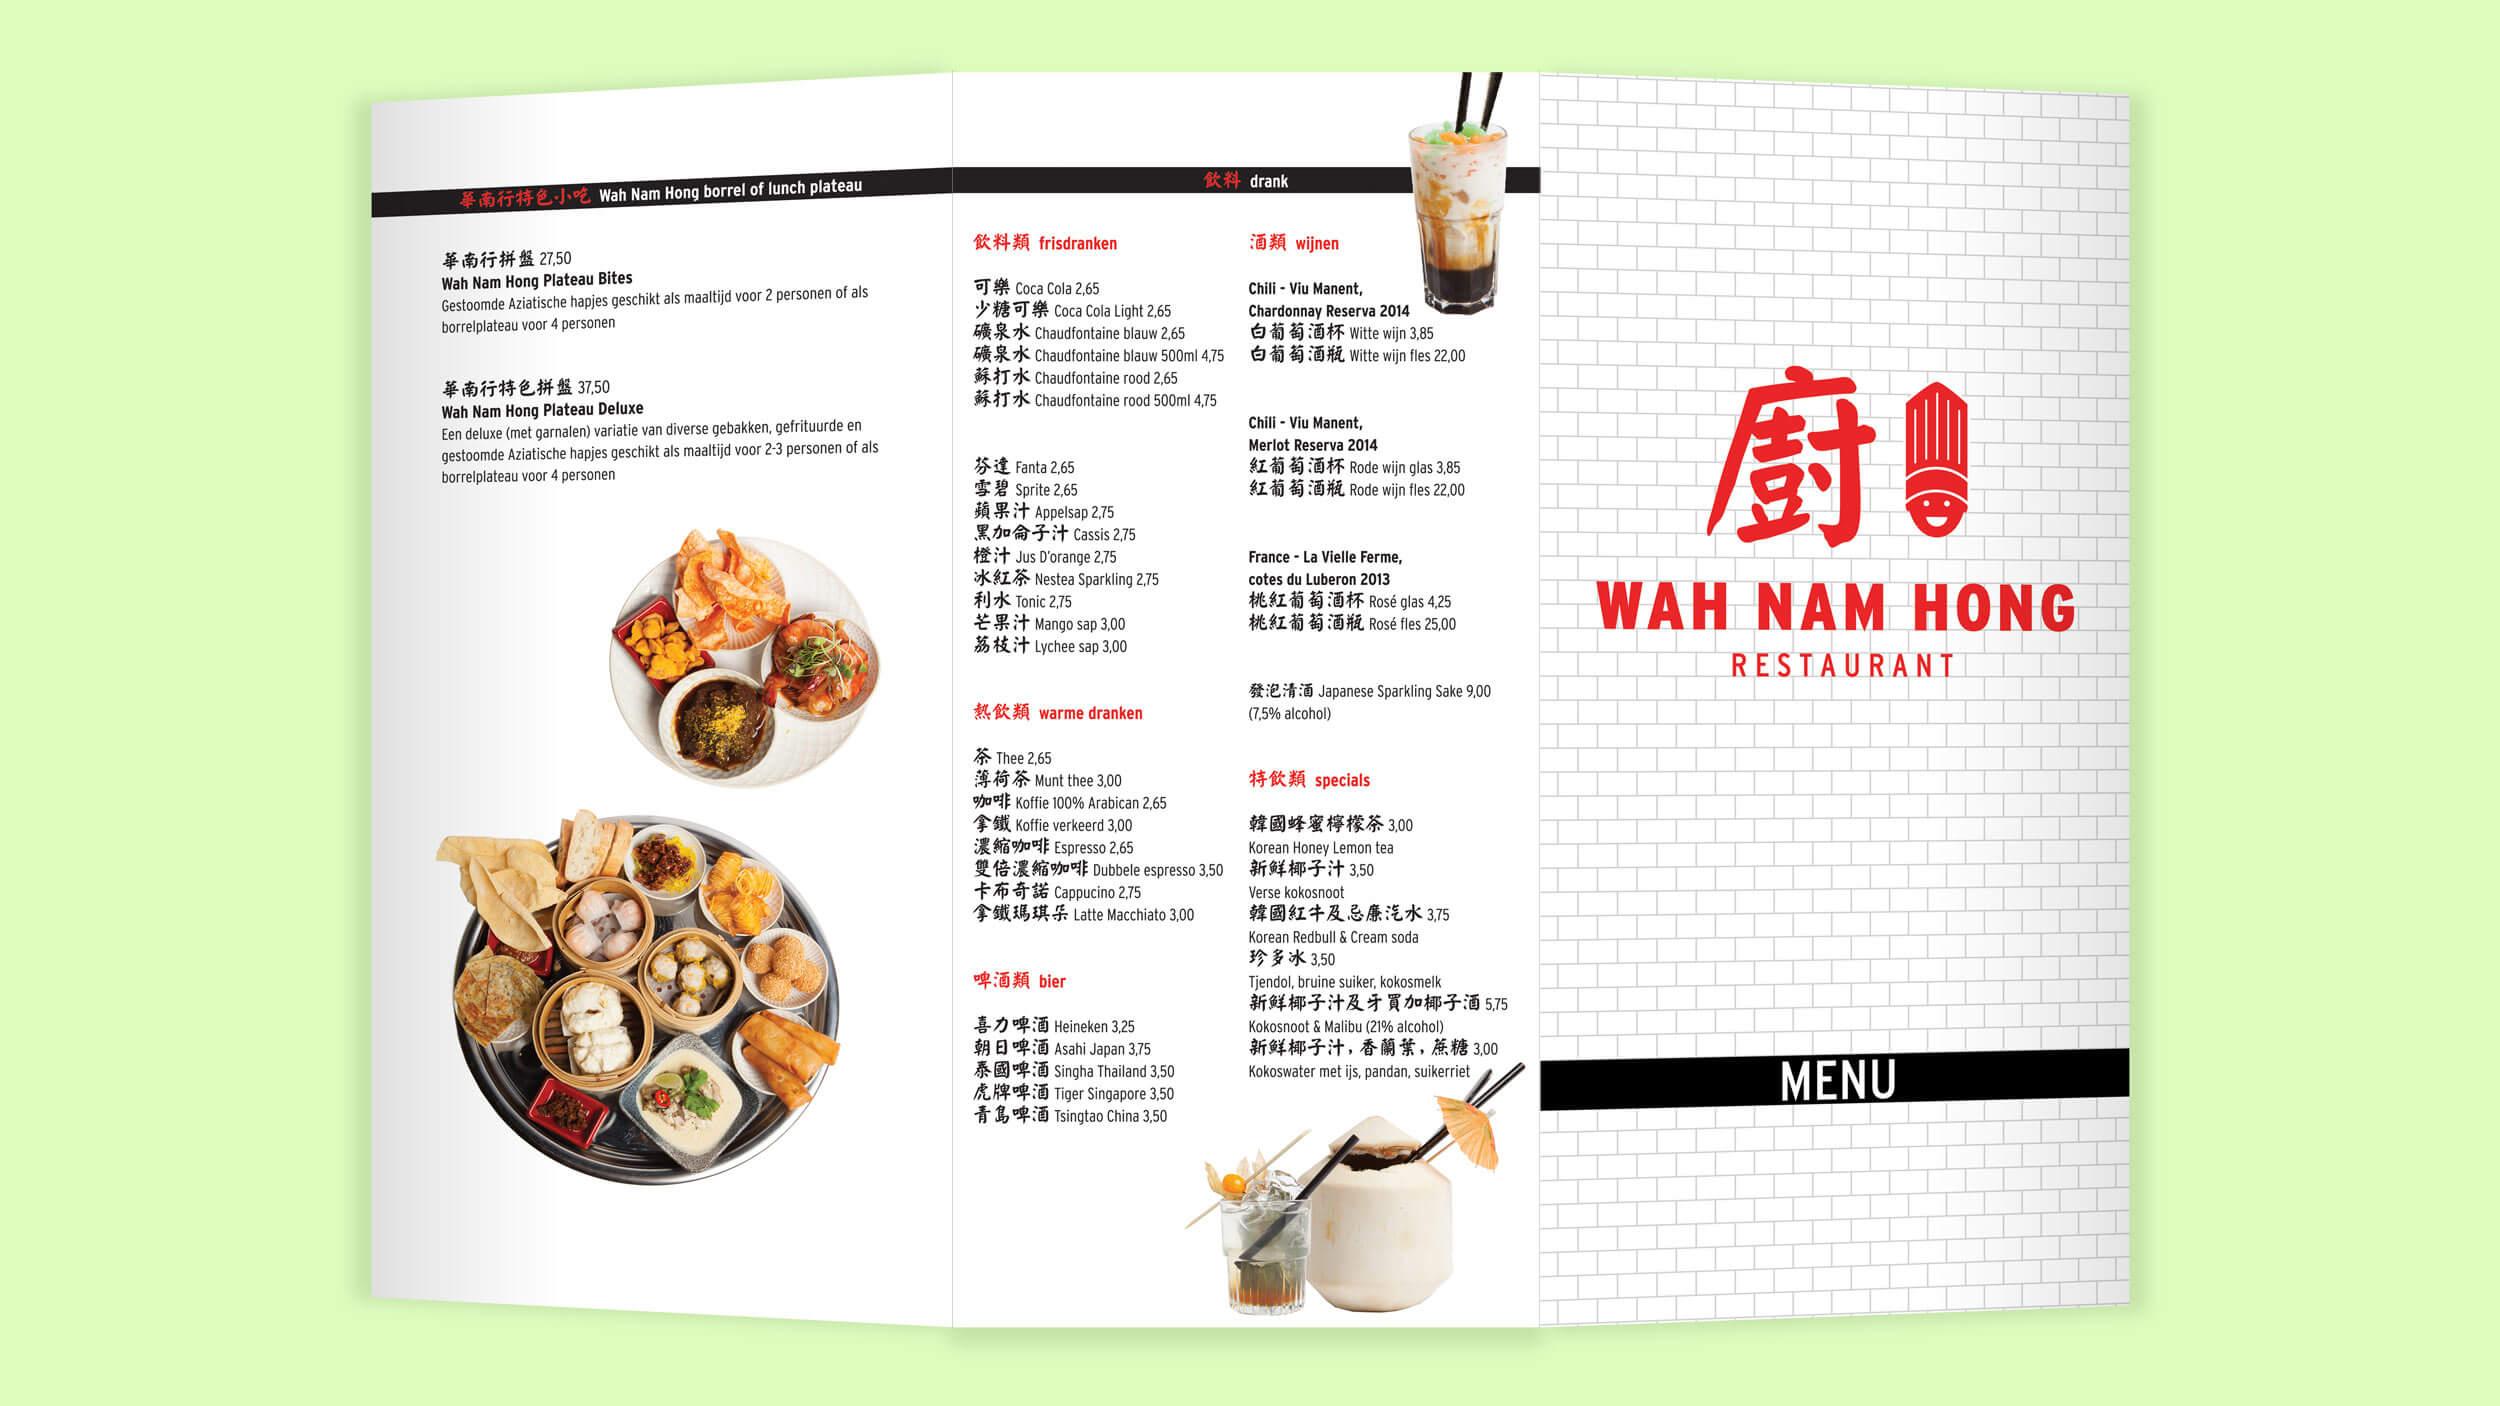 Wah Nam Hong, menukaart, Mixus studio